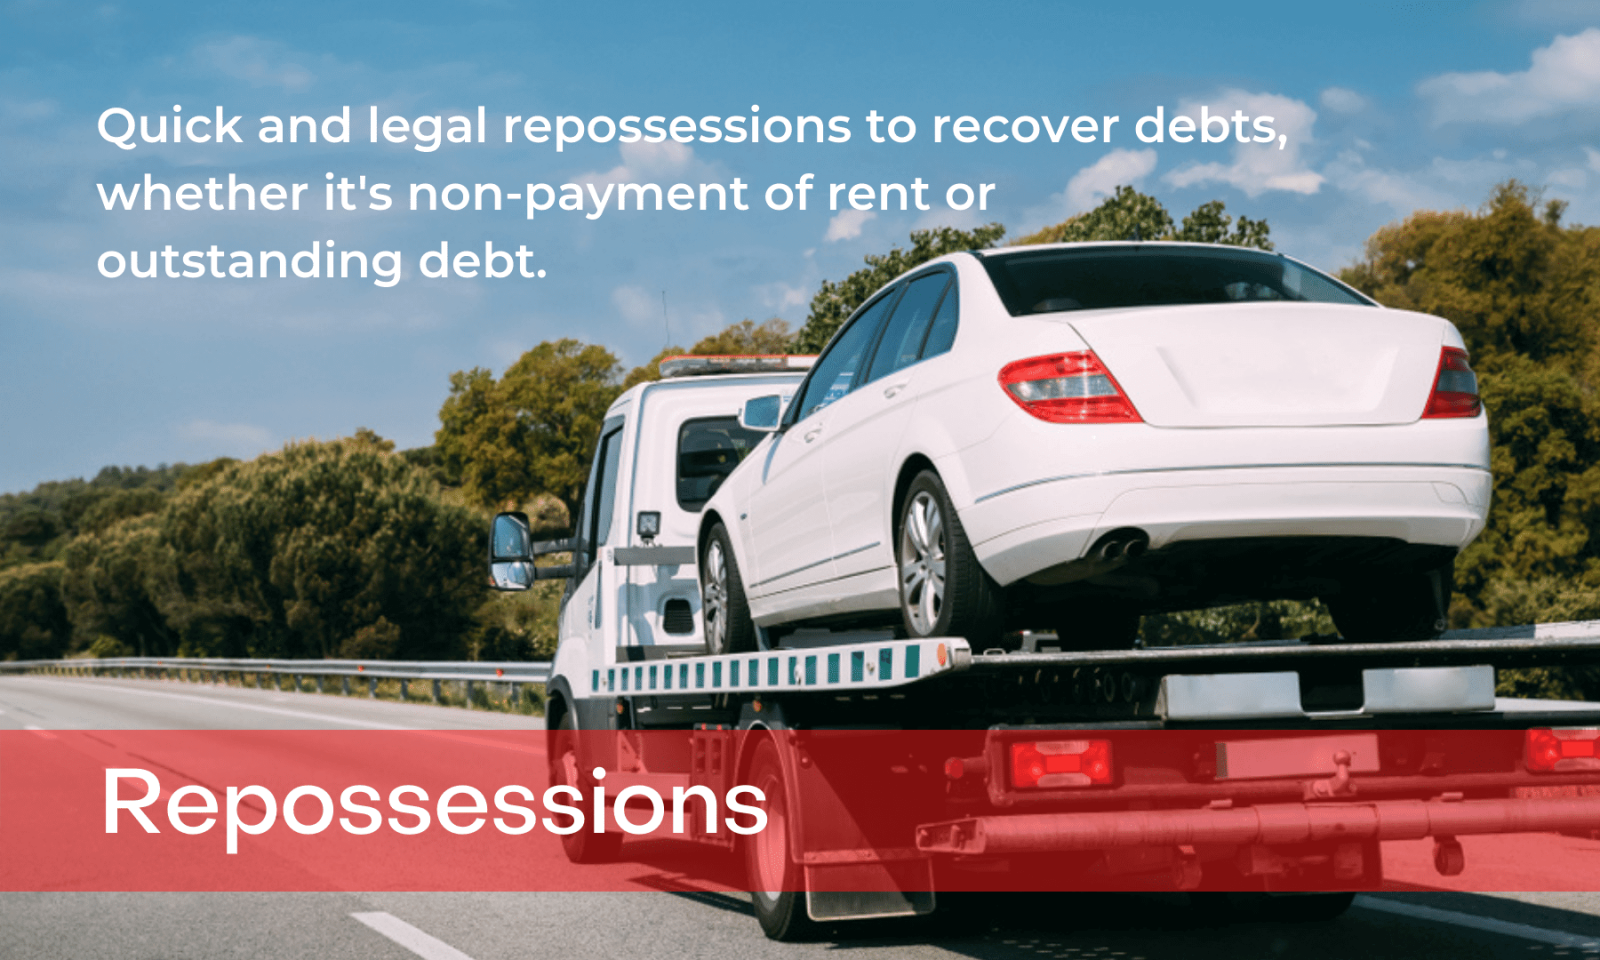 Repossessions